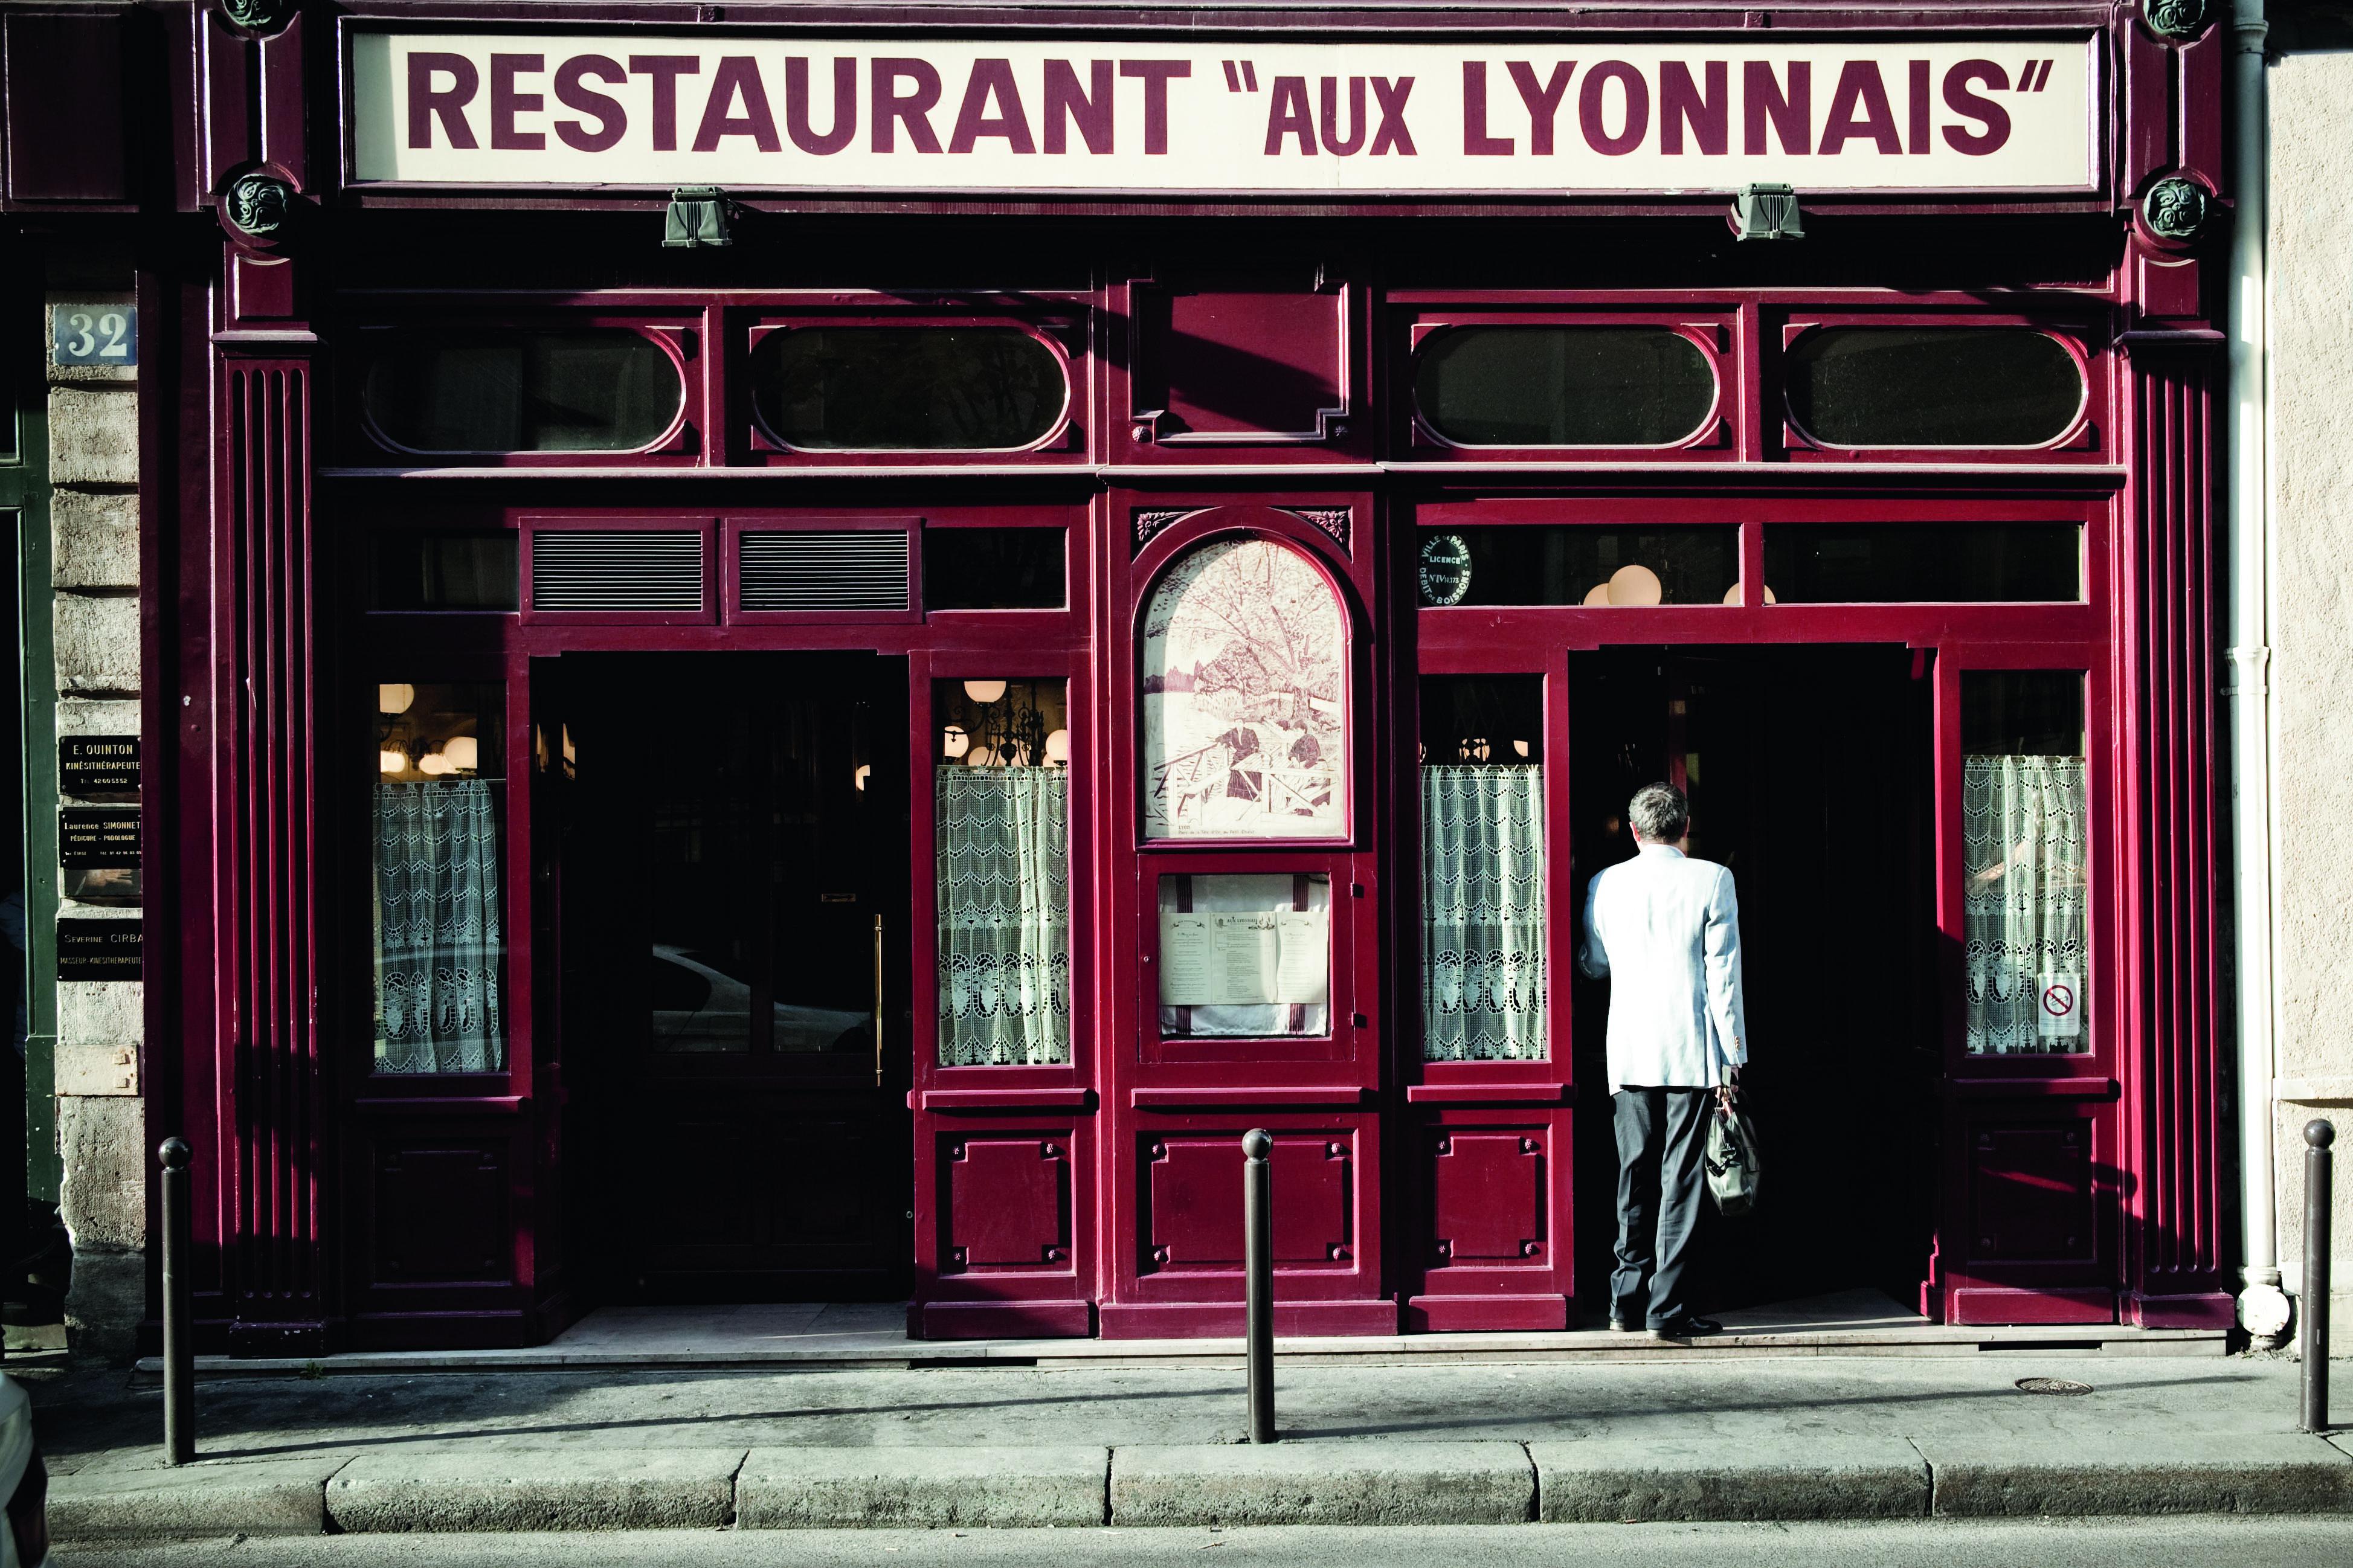 Adhérent AUX LYONNAIS - photo #3488